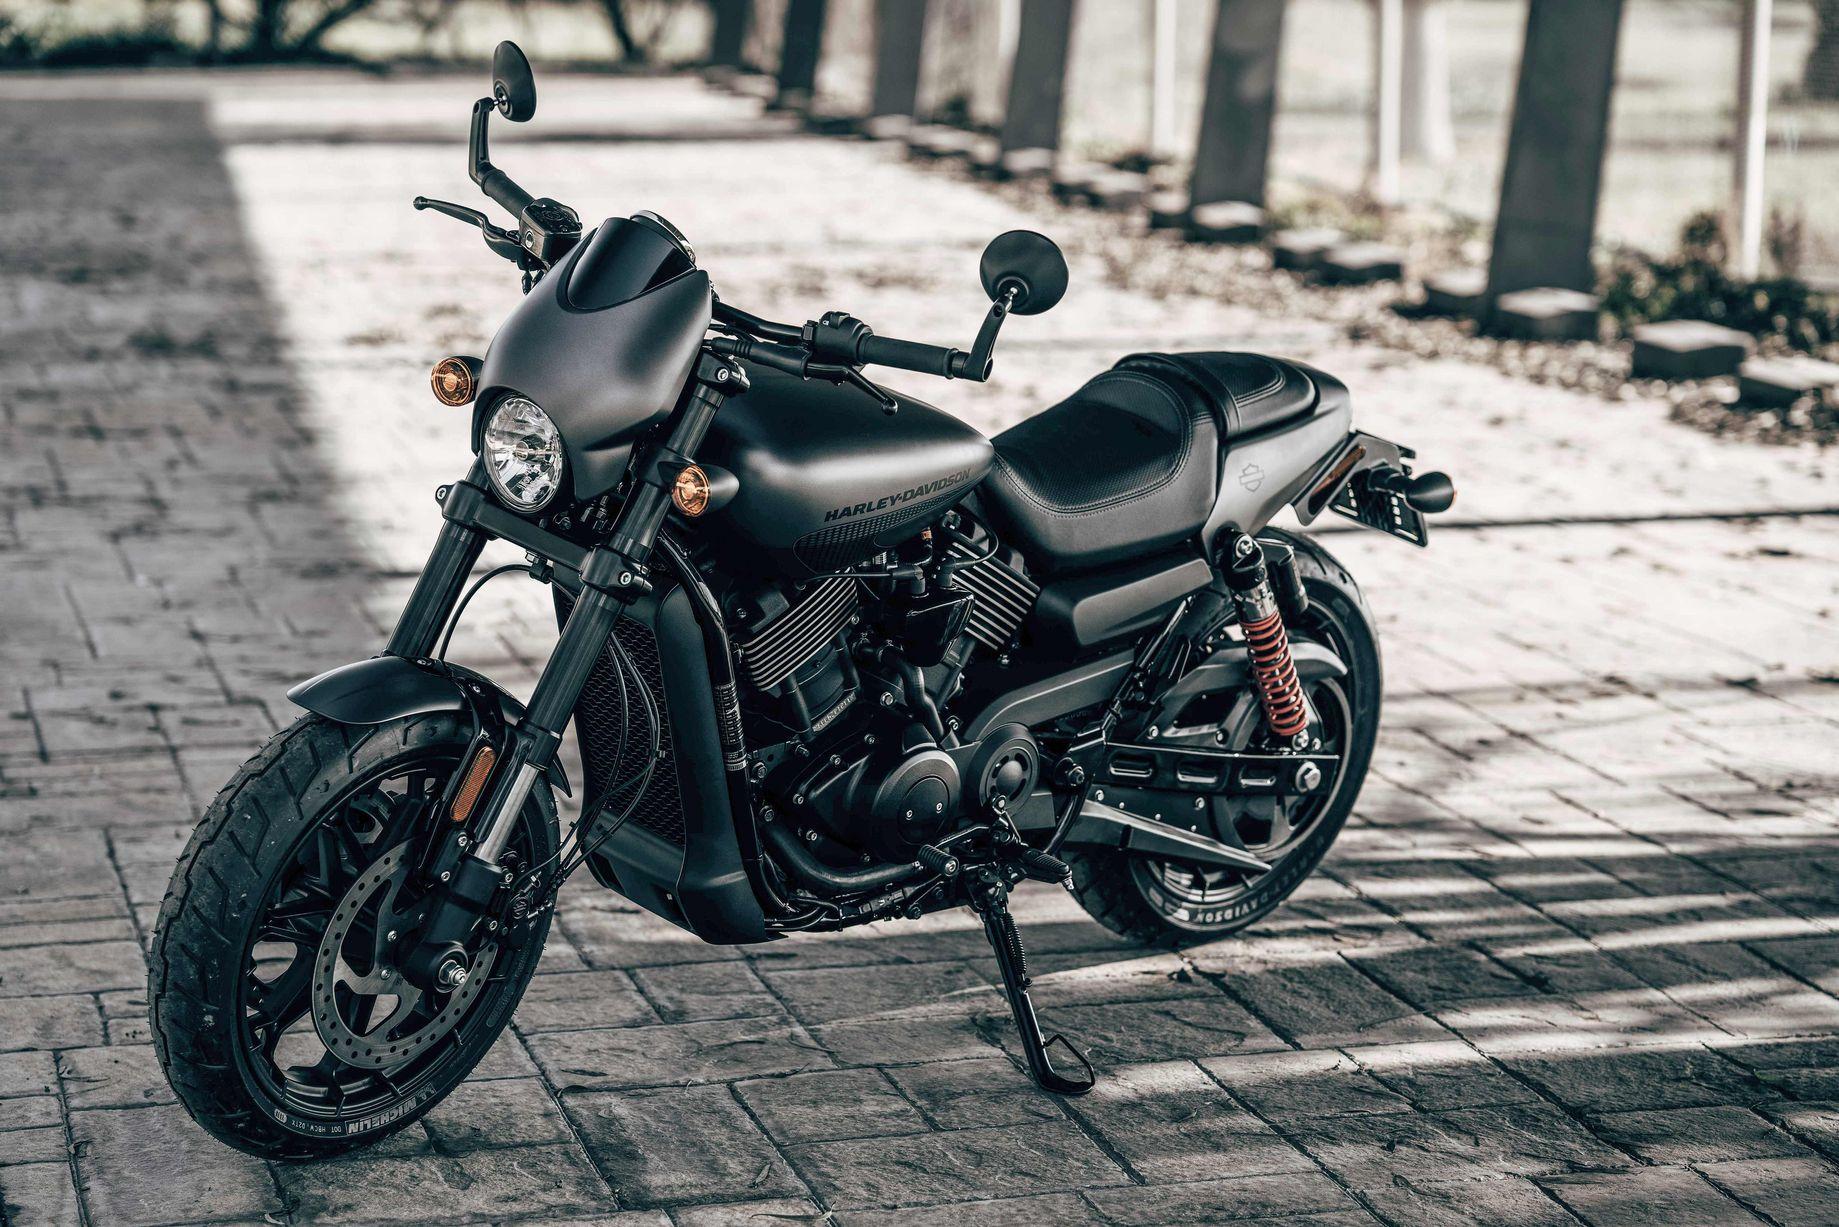 Harley-davidson Street Wallpaper - Street Rod 750 2018 , HD Wallpaper & Backgrounds